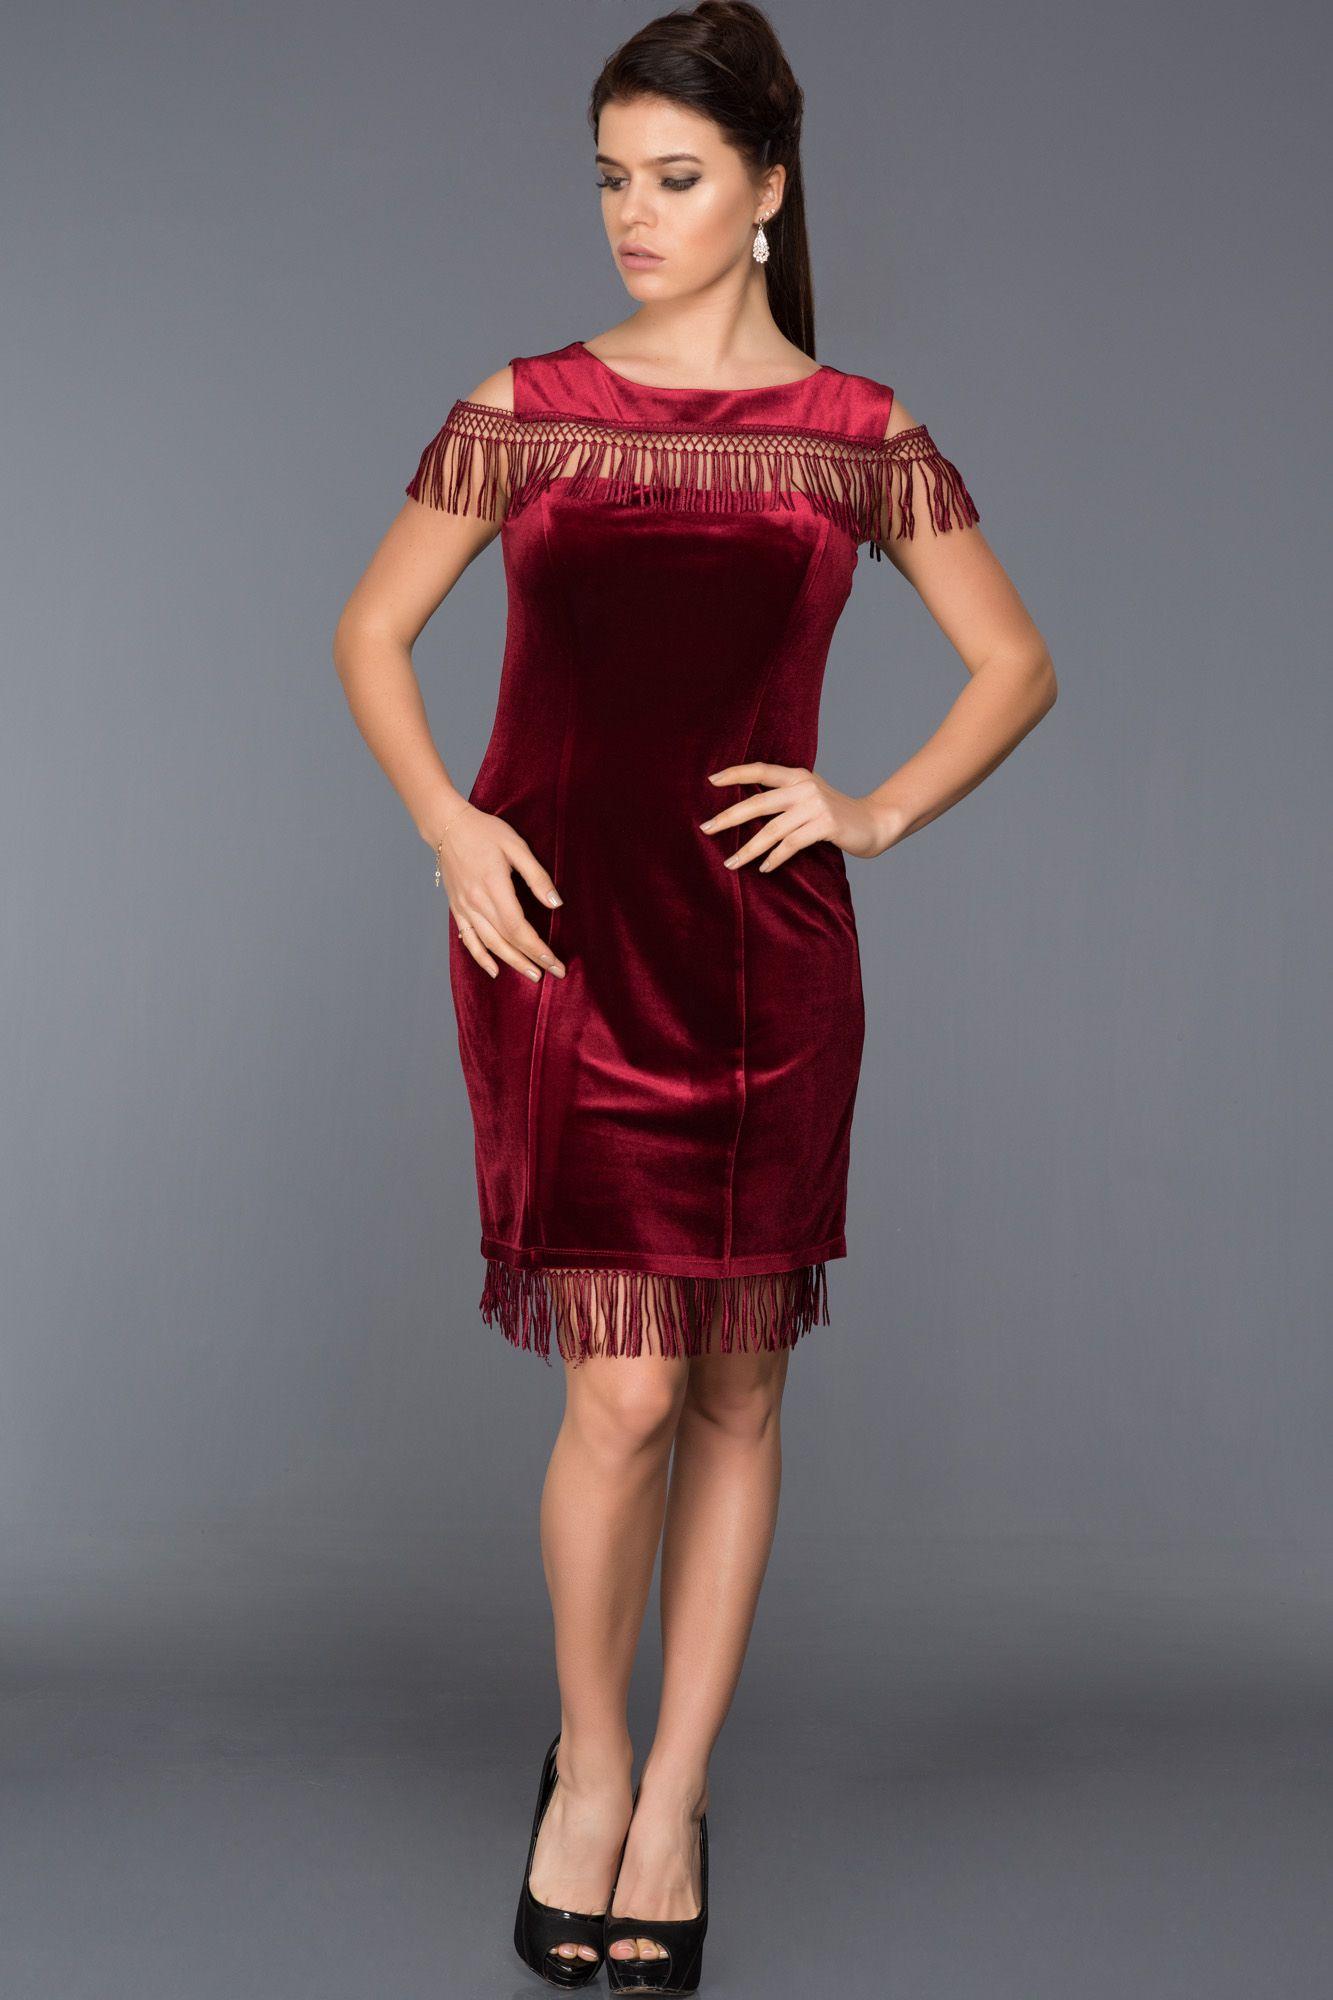 Bordo Puskullu Kadife Elbise Abk244 Kisa Elbiseler Elbise The Dress